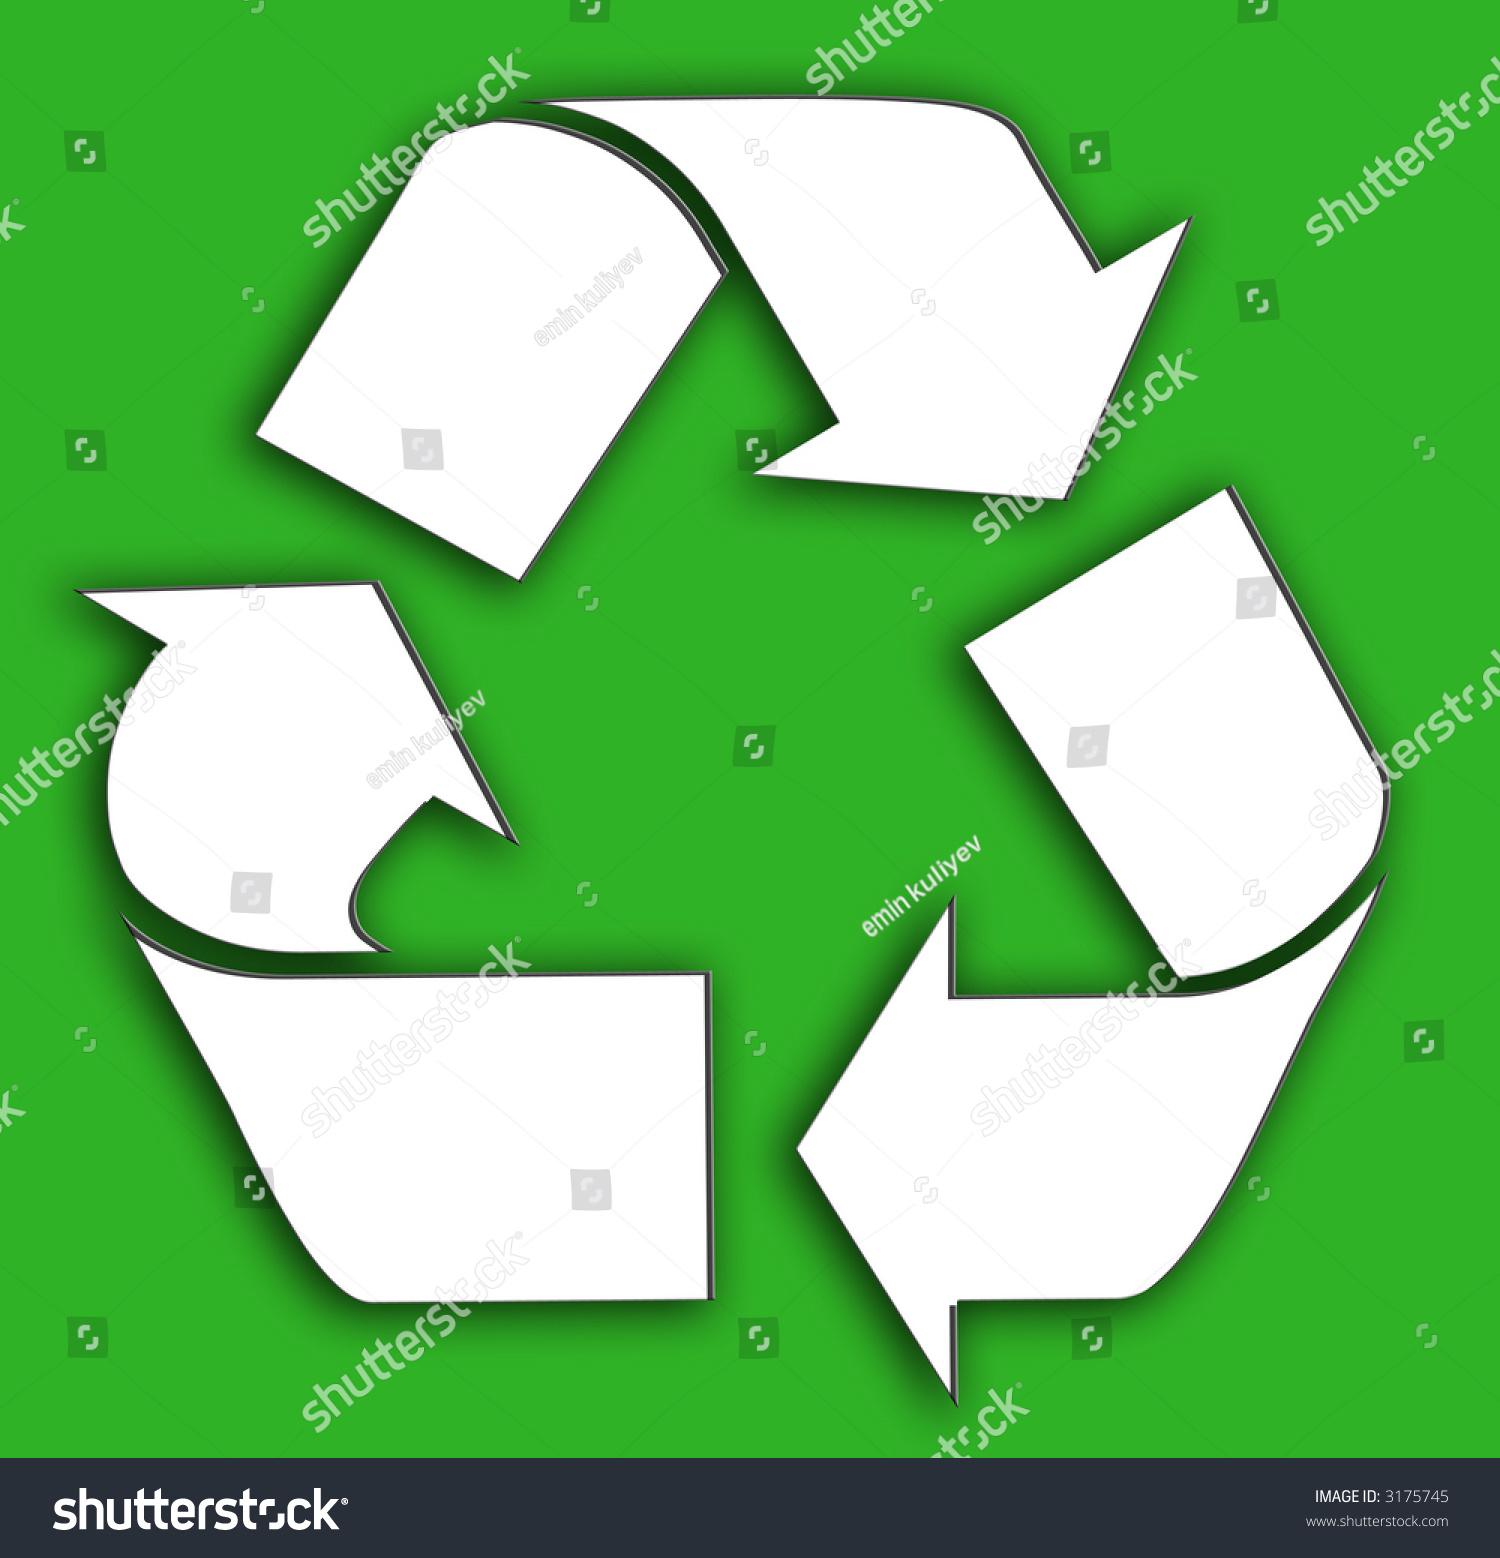 White recycle symbol stock illustration 3175745 shutterstock white recycle symbol buycottarizona Choice Image